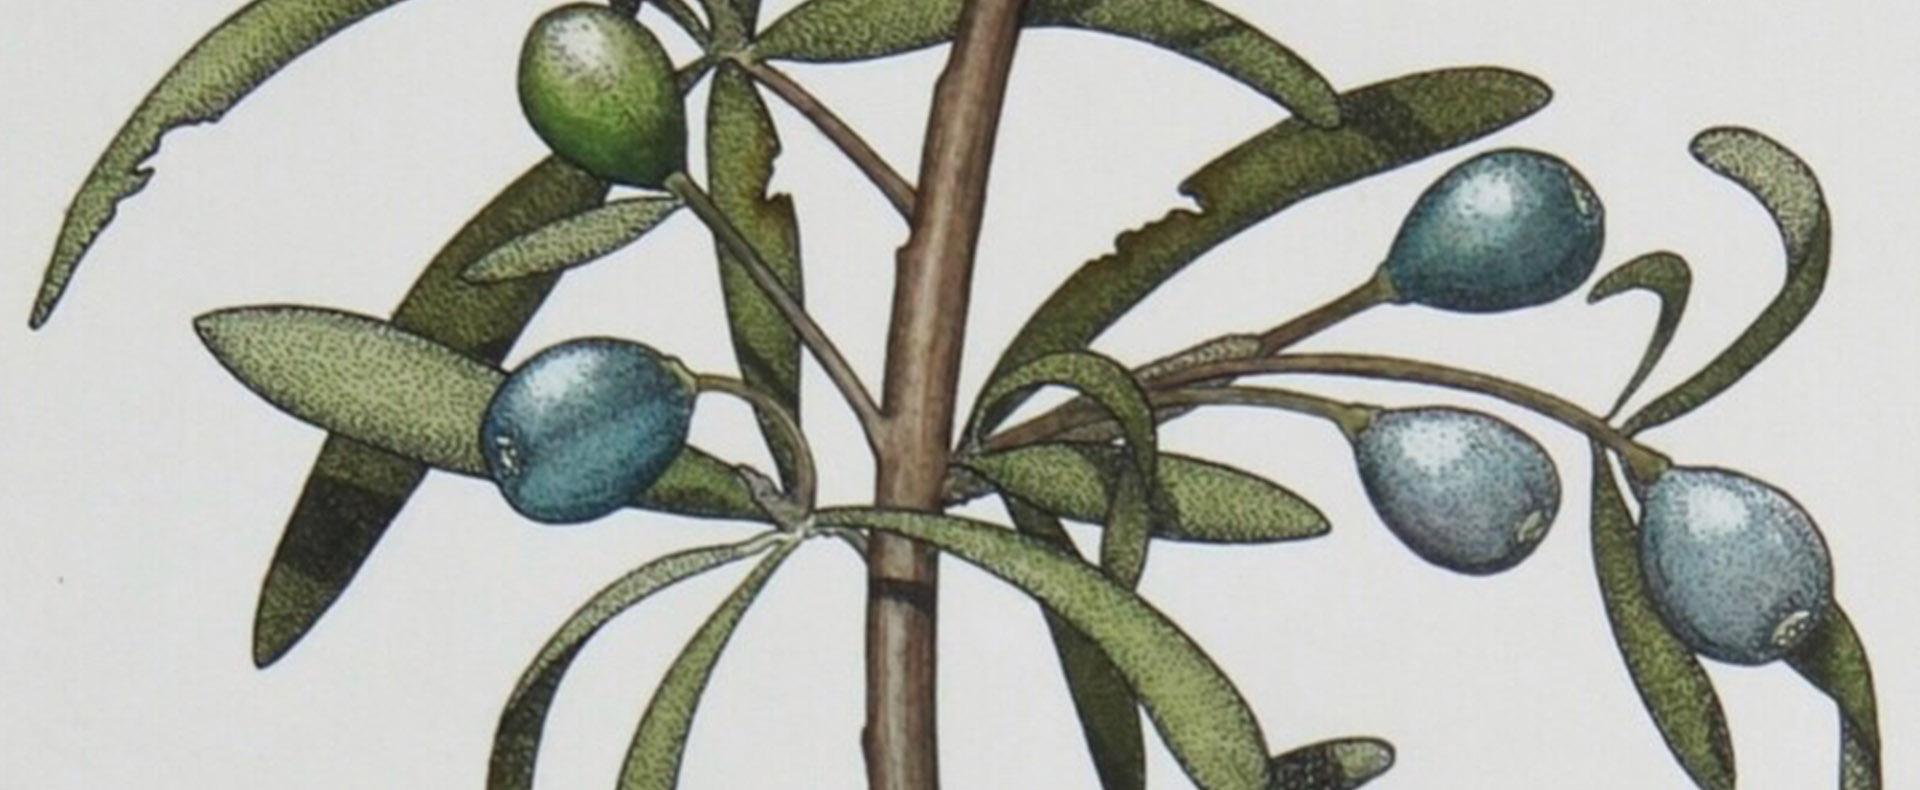 Scientific Illustration Workshops: Plant Studies